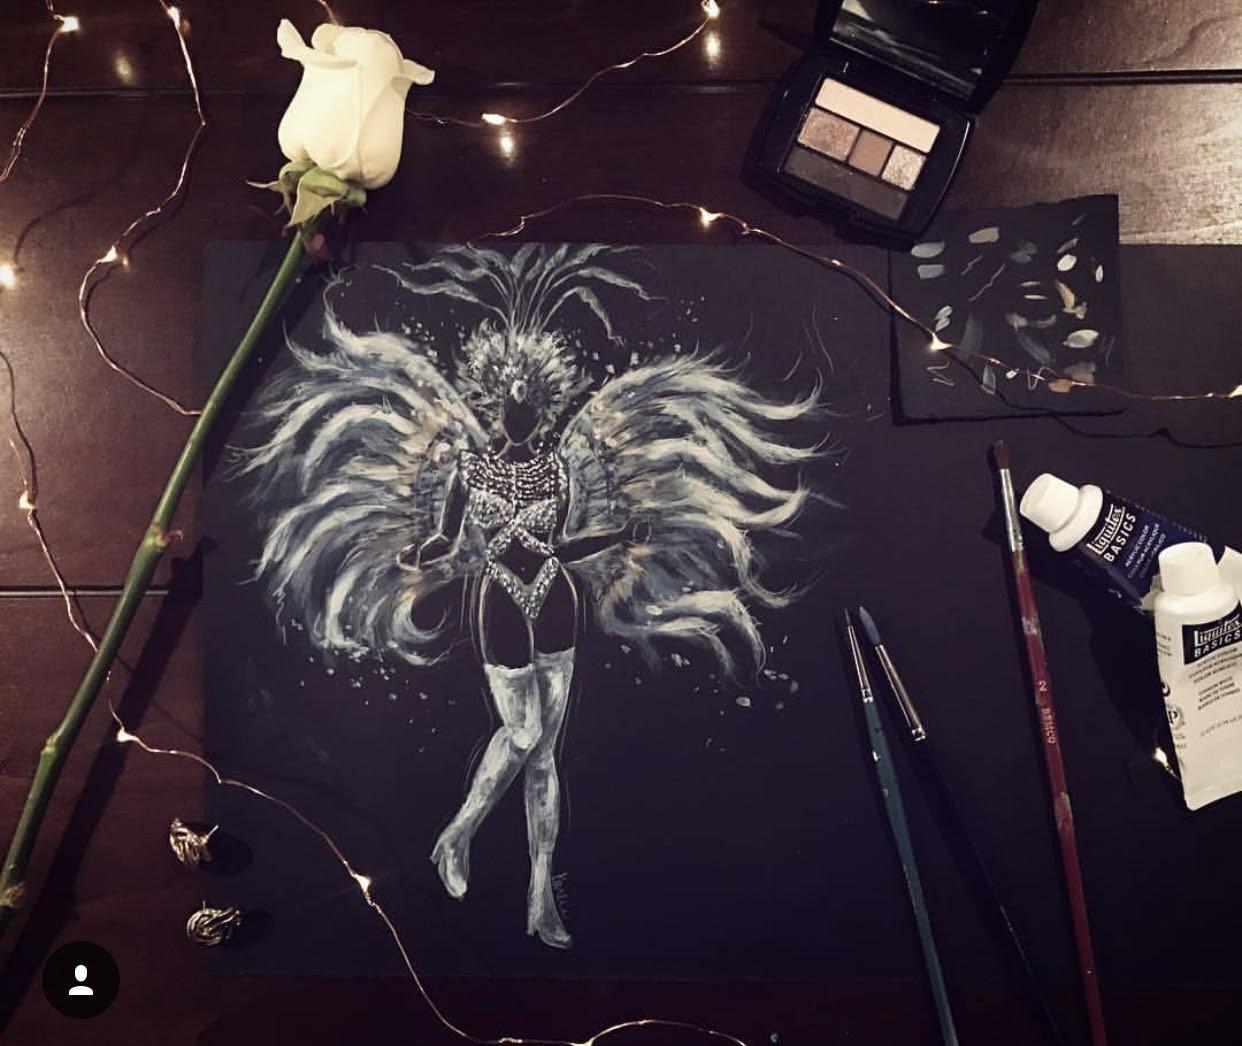 Fashion Illustration: acrylic paint on black paper